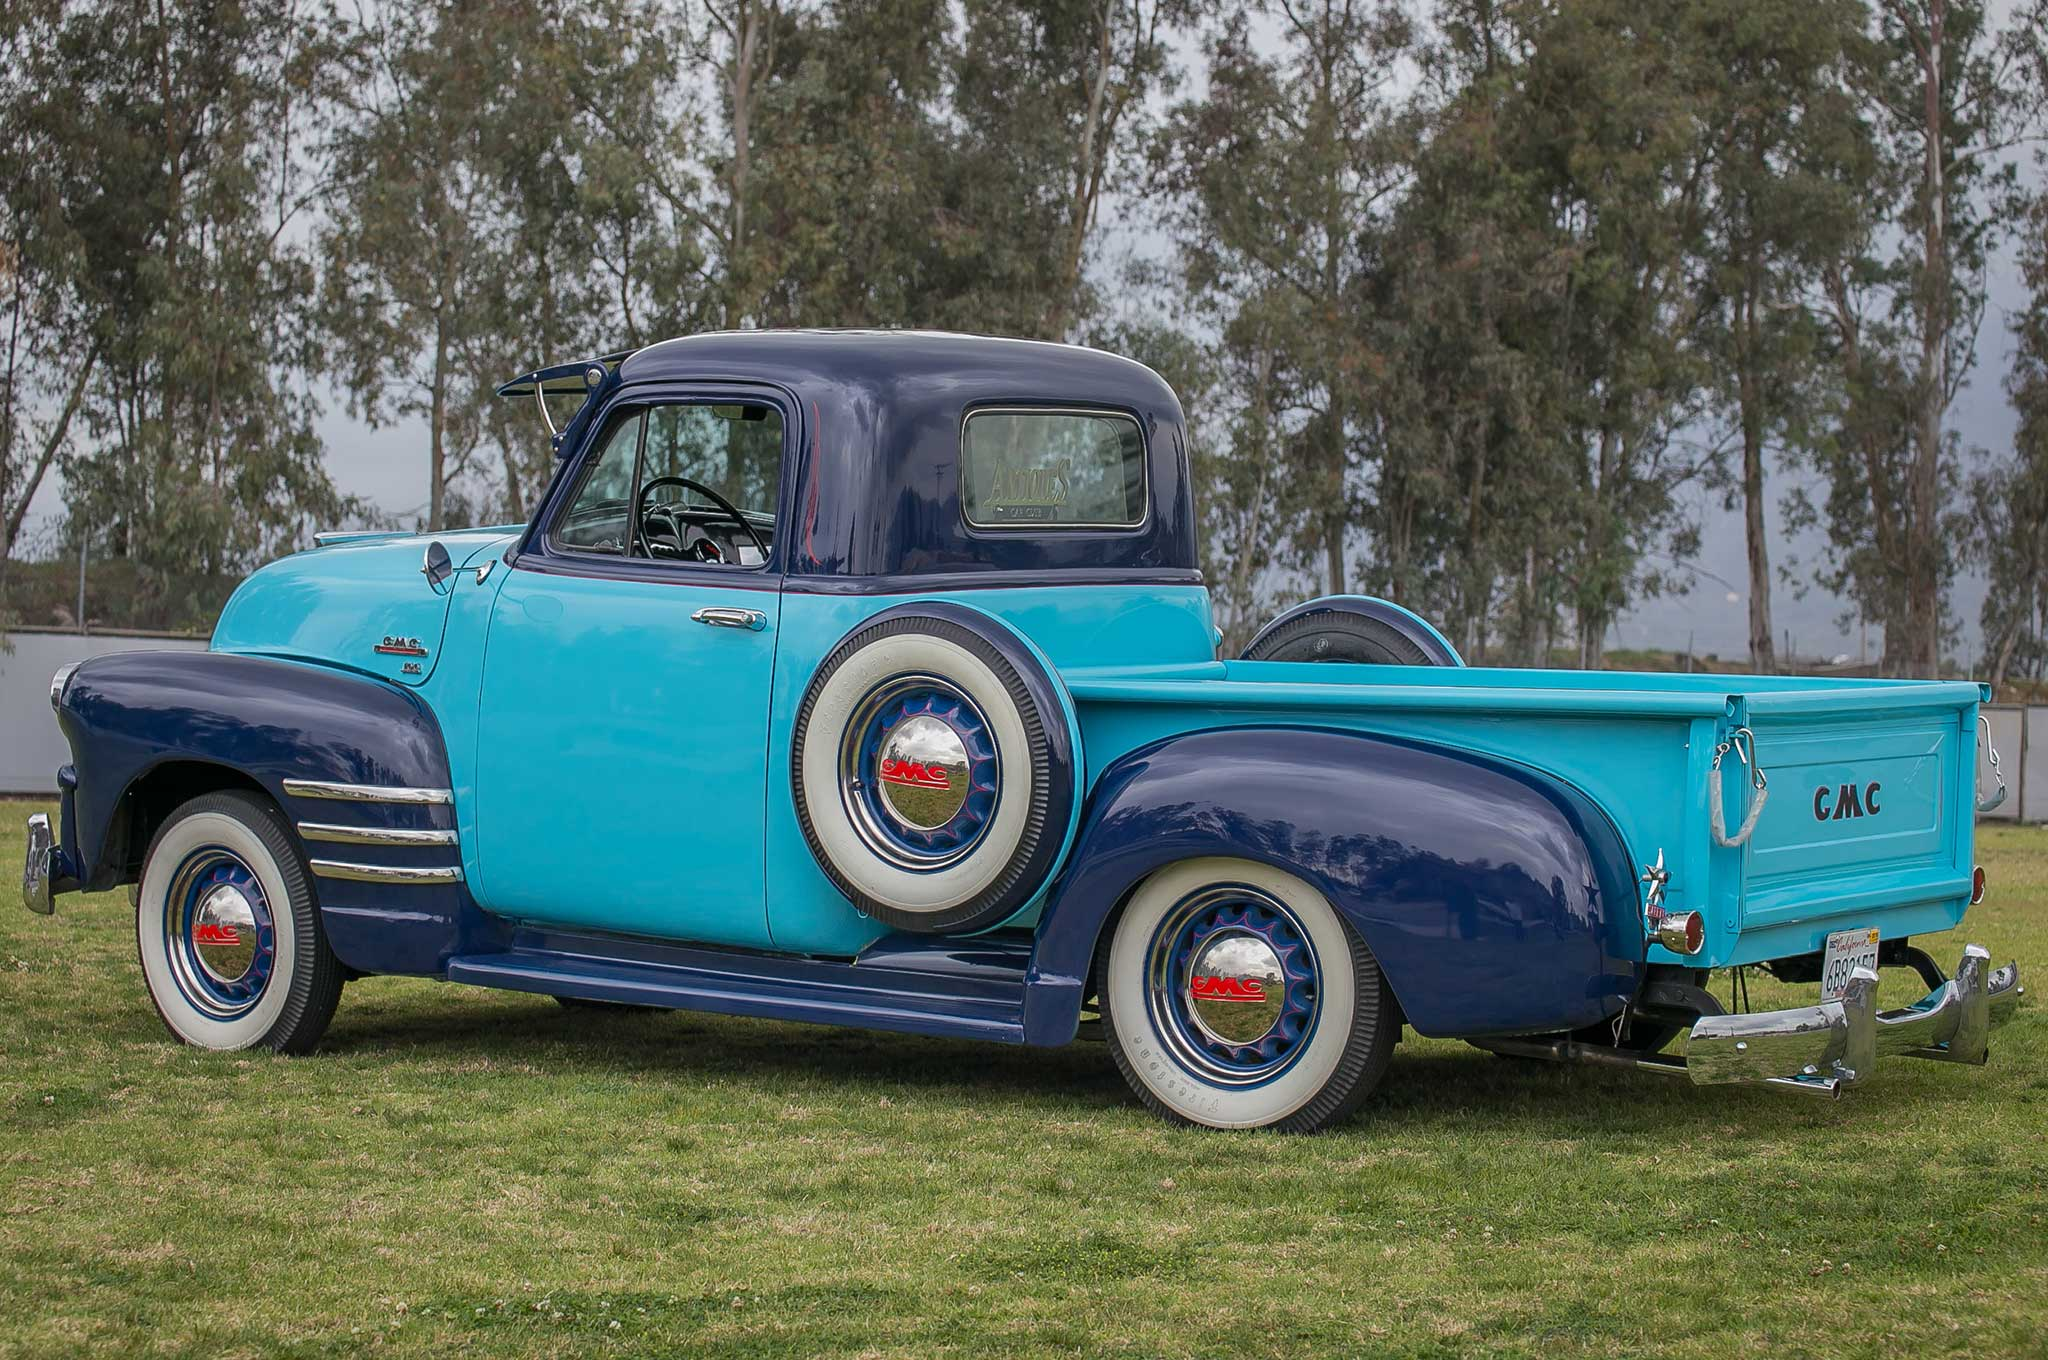 1954 GMC Pickup - Generational GMC - Lowrider